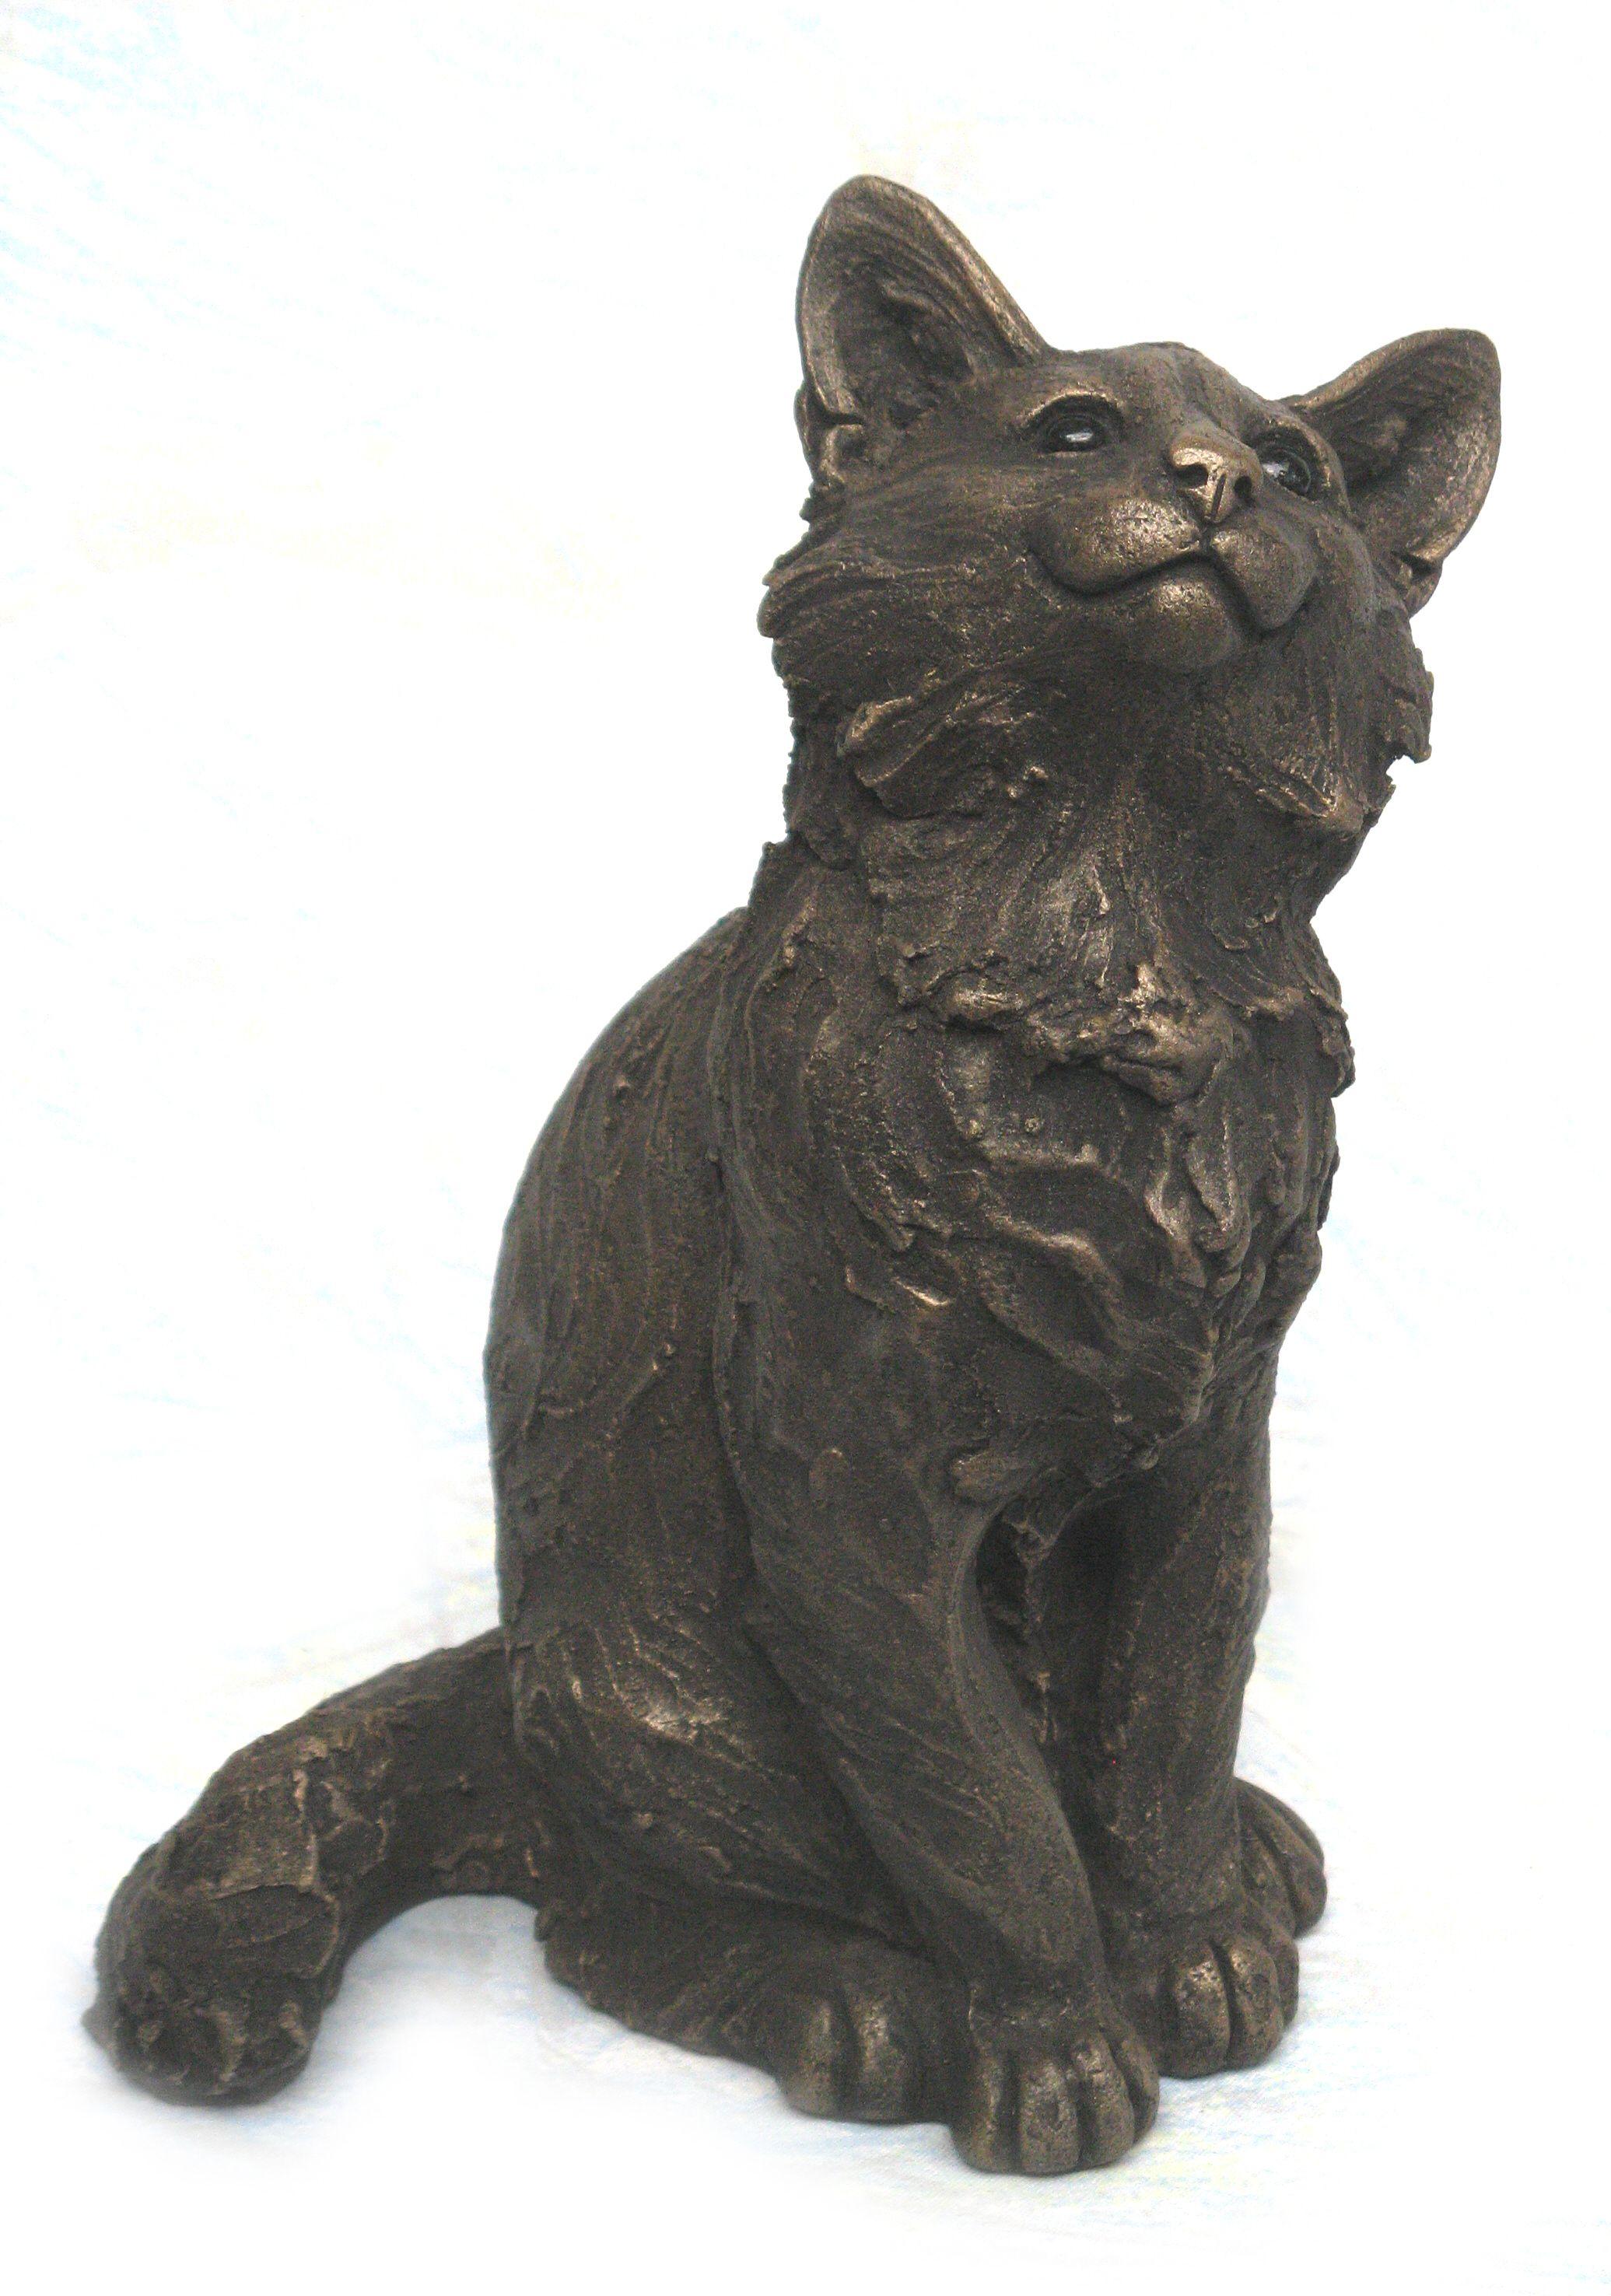 in product overstock satuette cat home stone lucky free handmade neko garden maneki shipping japanese indonesia today statue